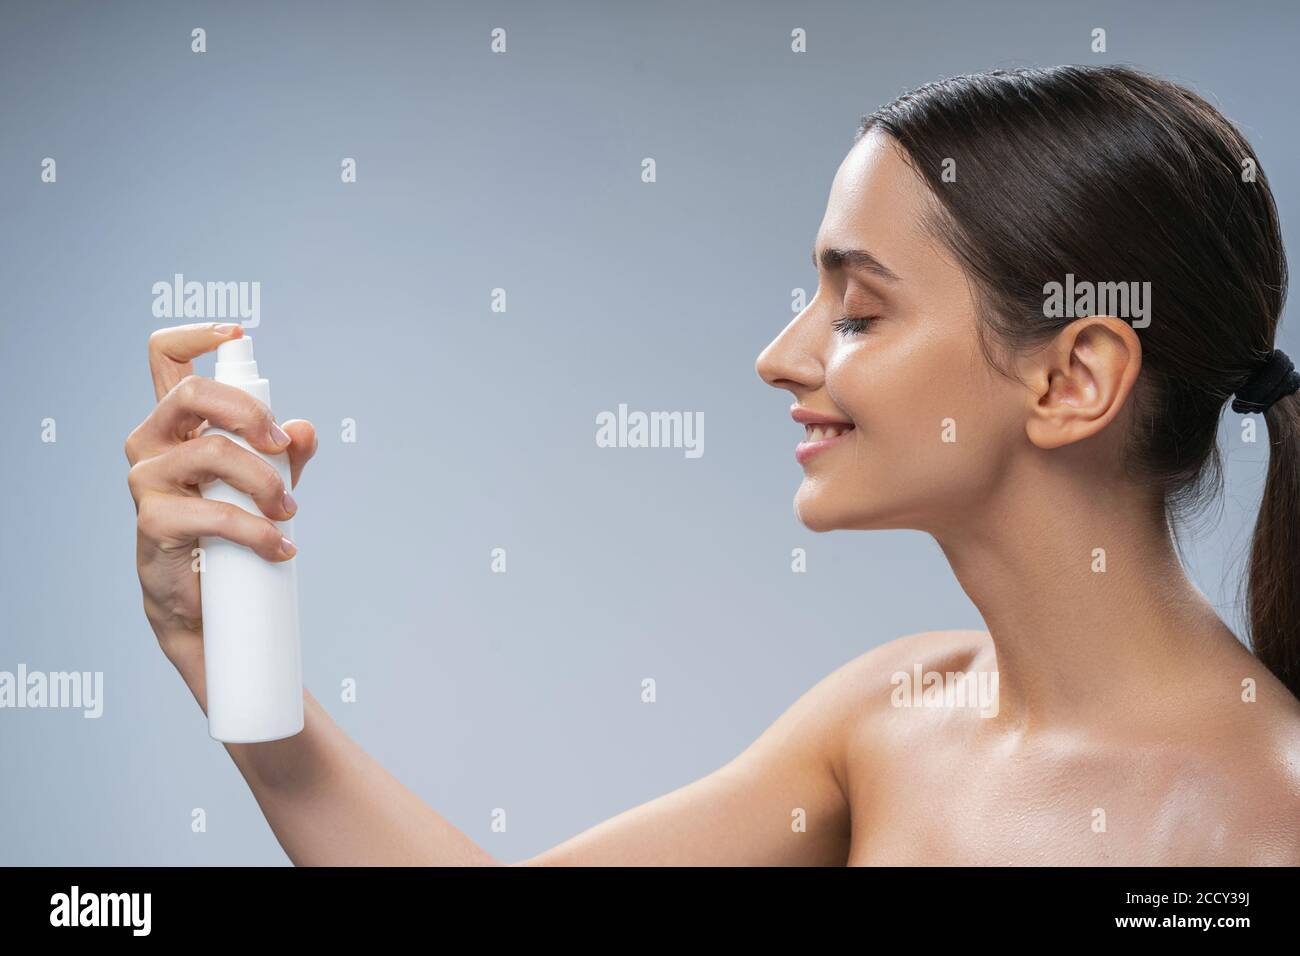 Woman spraying thermal water on her skin Stock Photo